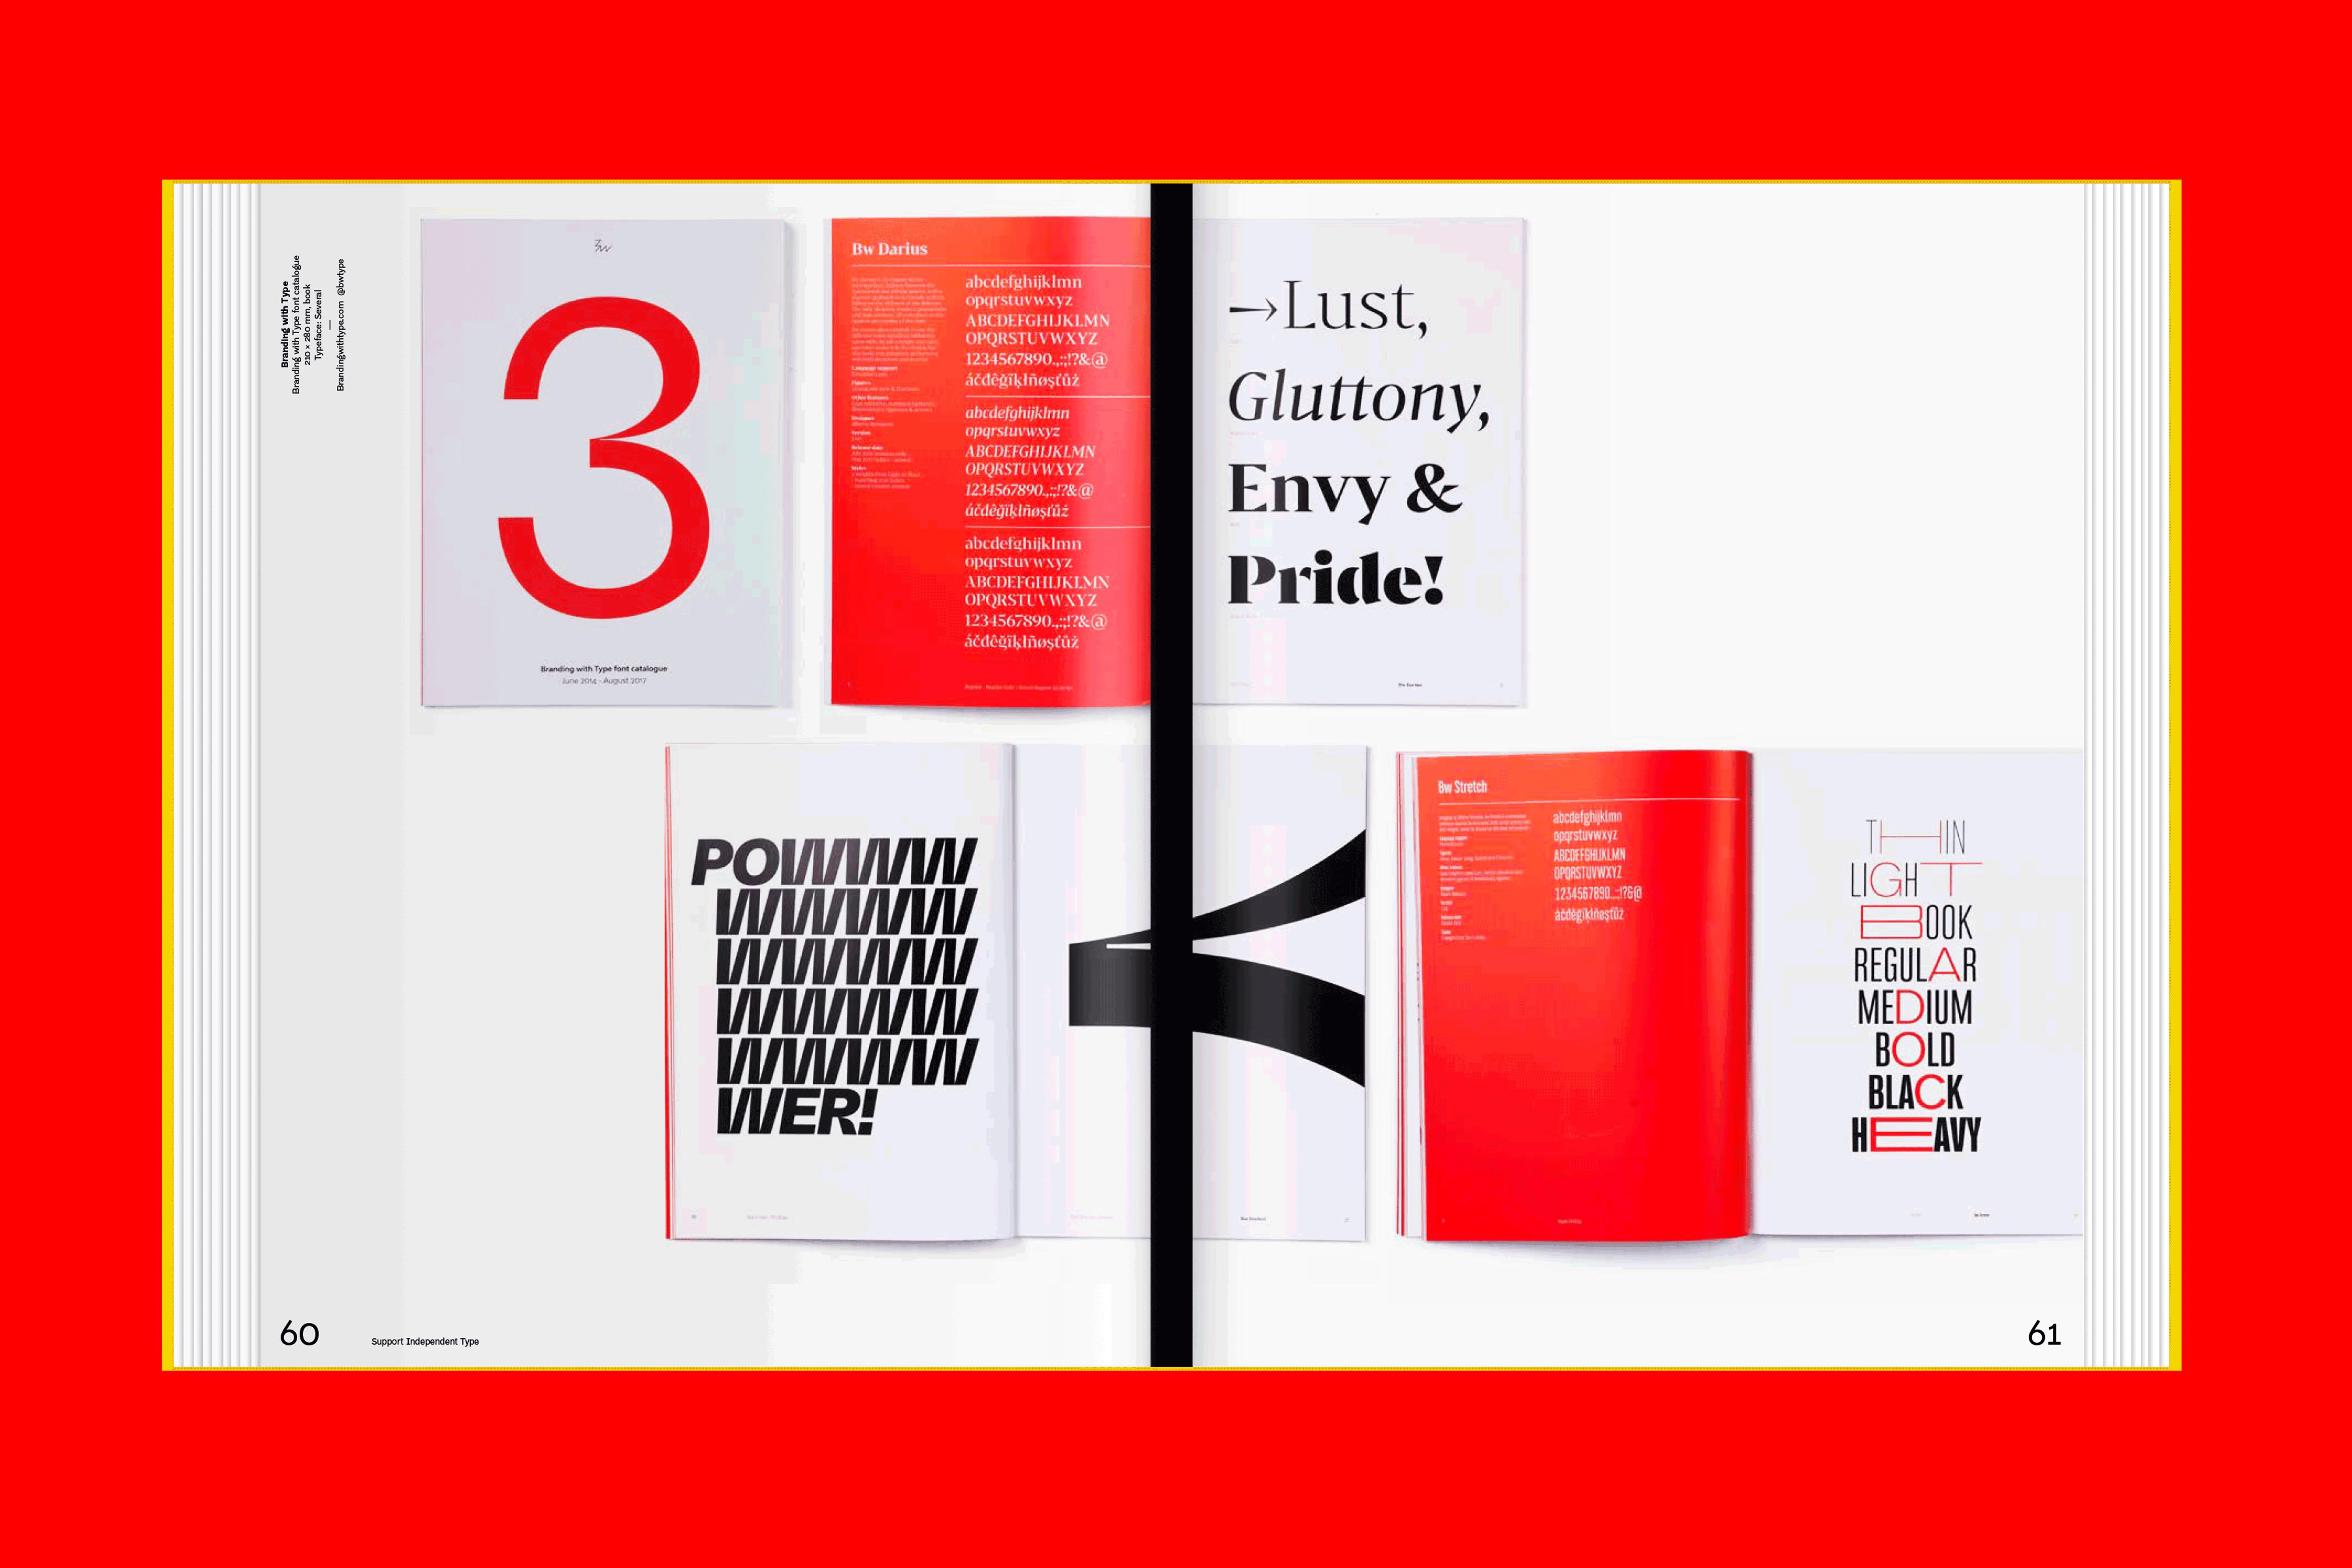 Slanted-Publiaktionen-Slanted-Publishers-Support-Independent-Type_14